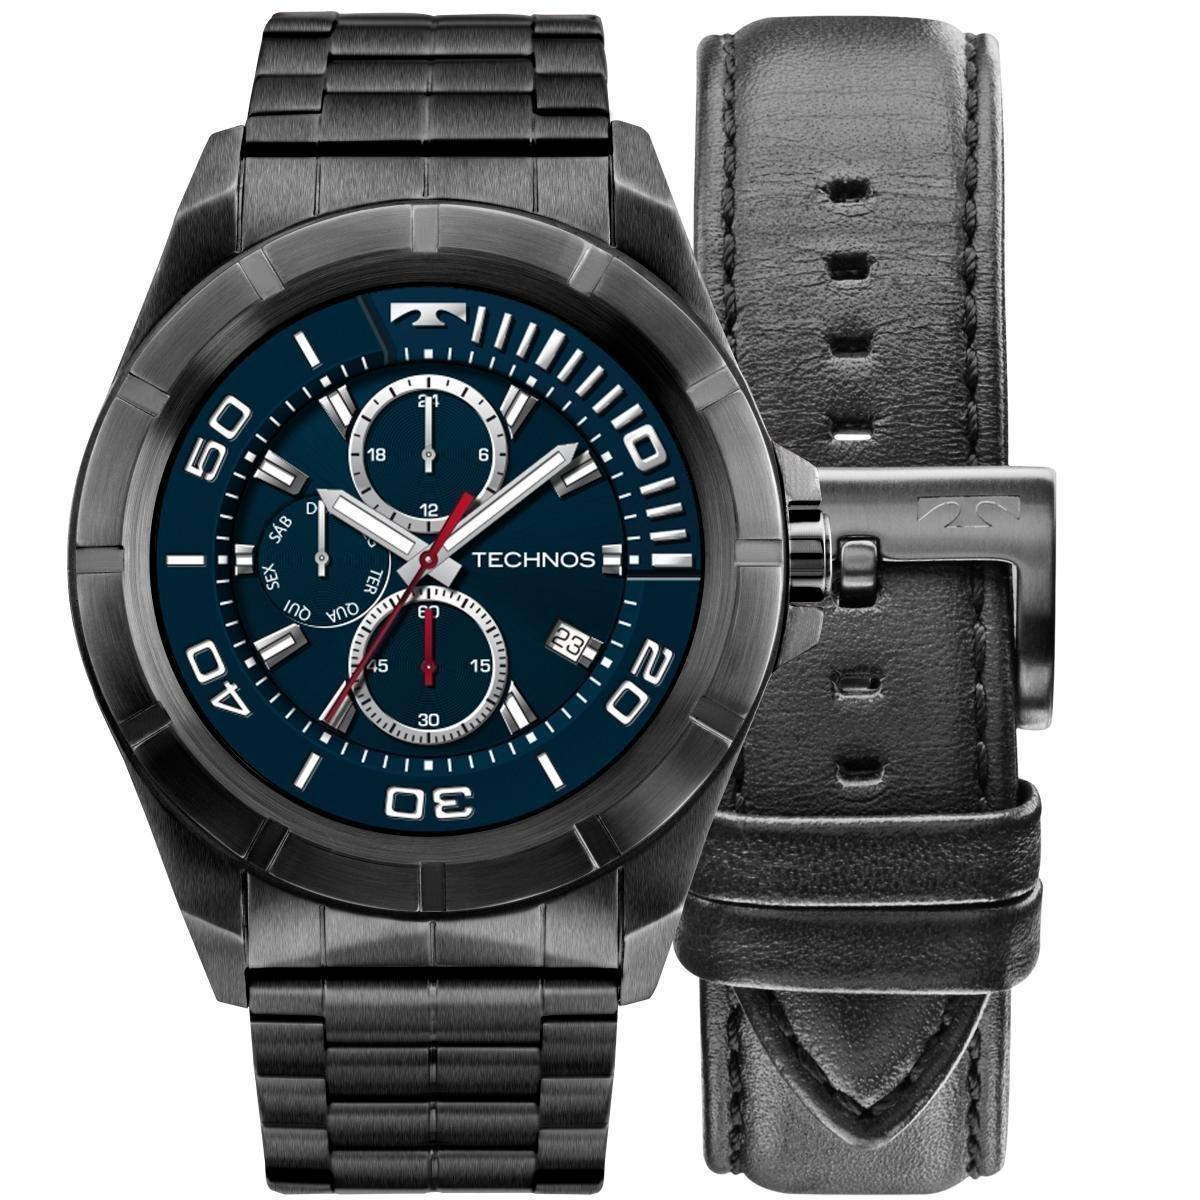 5018db01c9c Relógio masculino technos connect smartwatch srac preto jpg 1200x1200 Relogios  masculinos technos ver